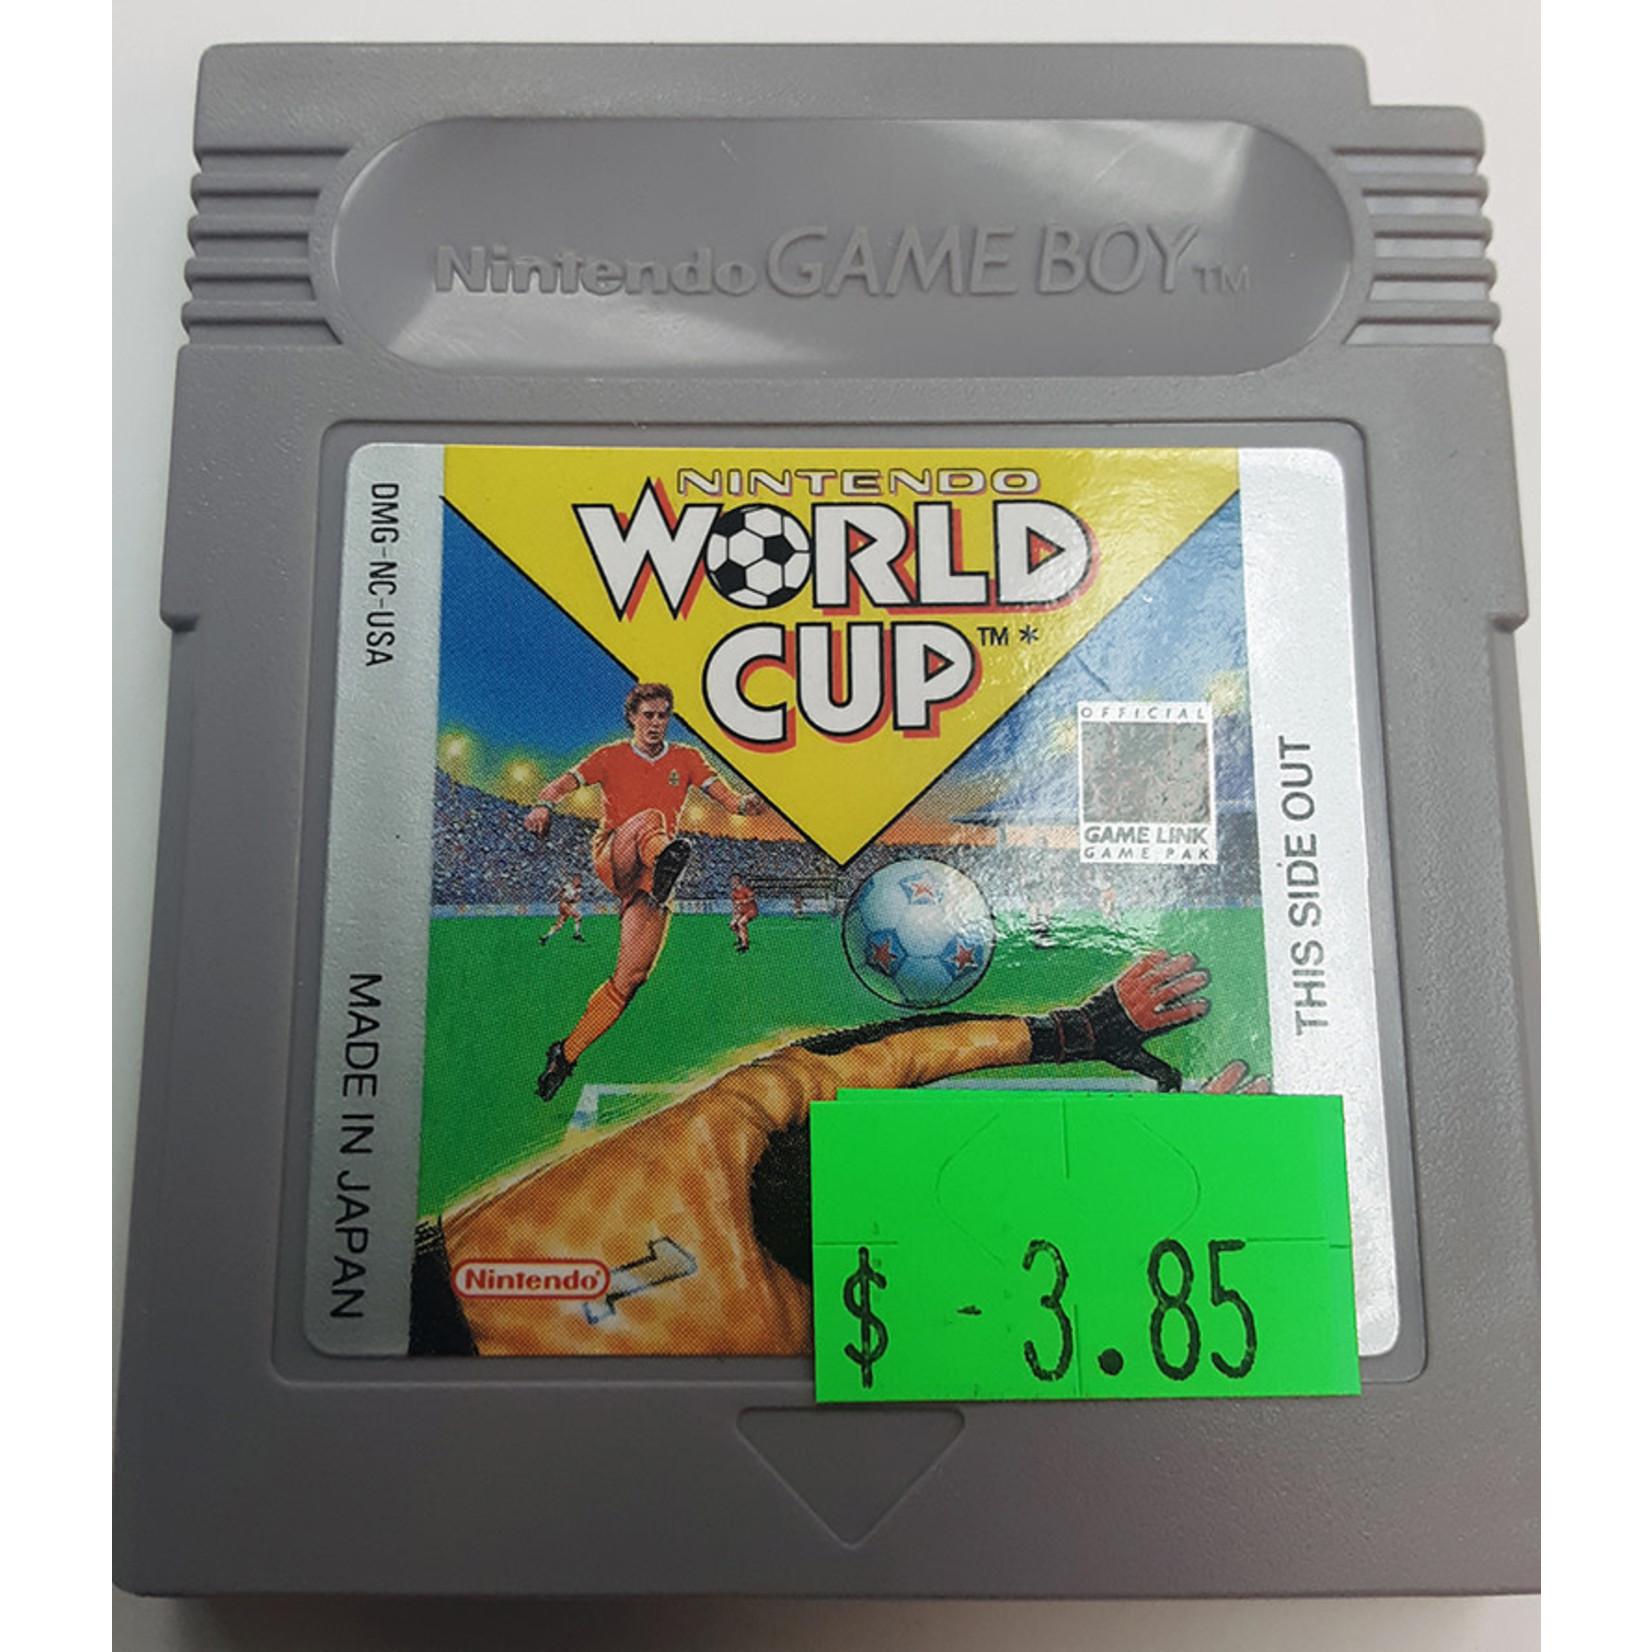 GBu-Nintendo World Cup (cartridge)